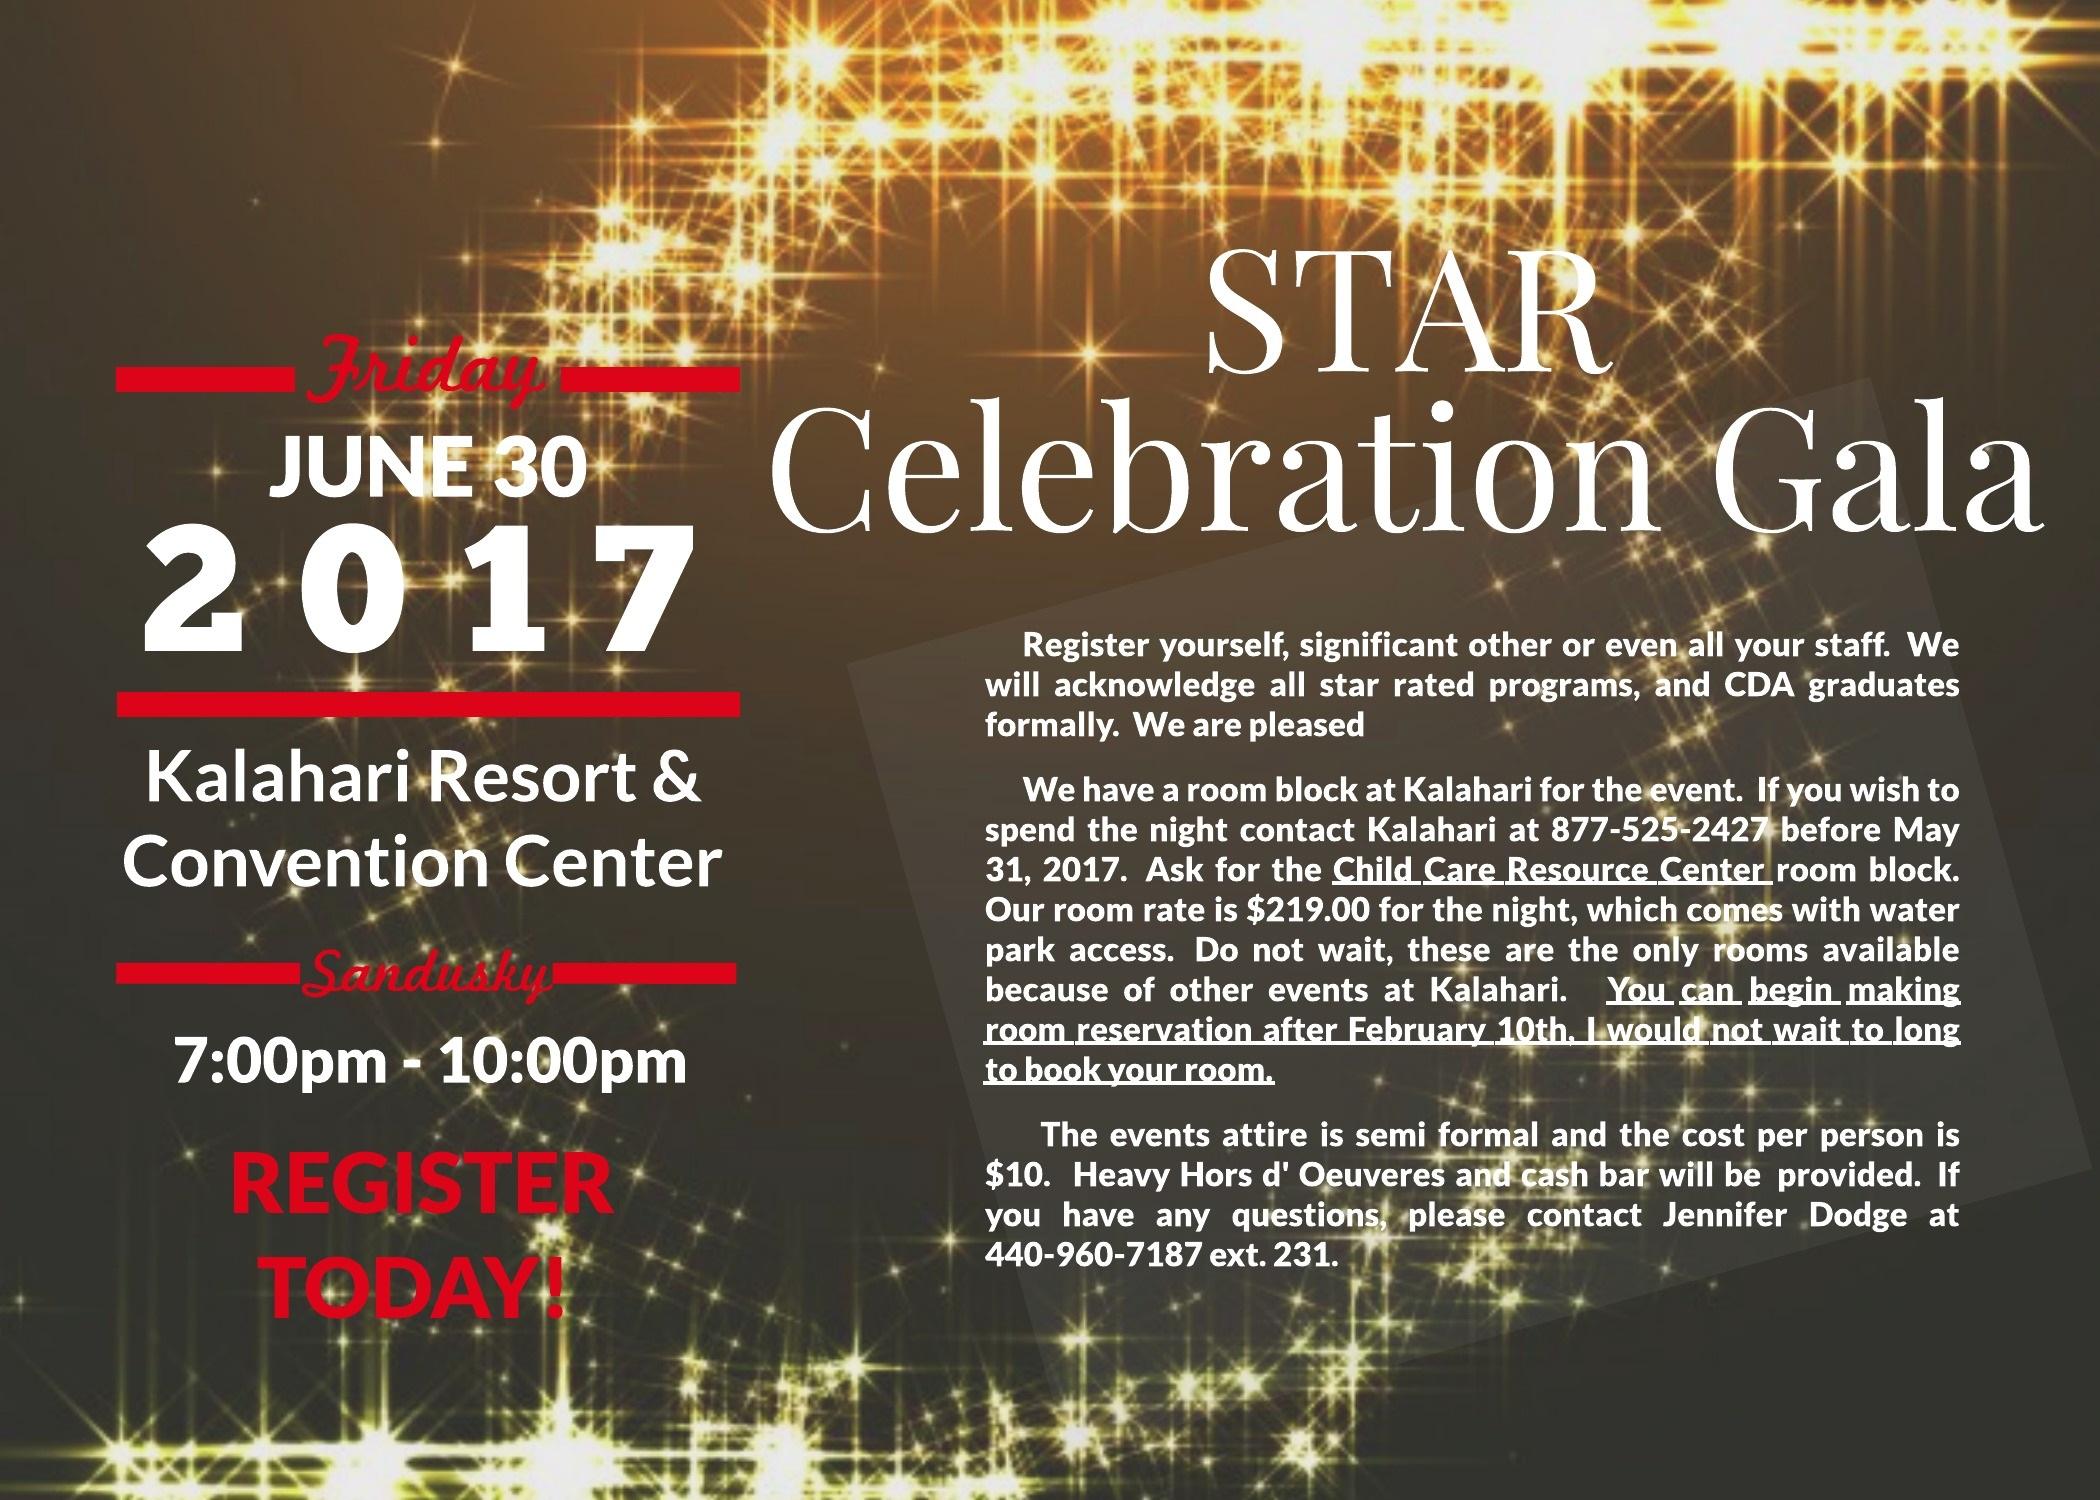 STAR Celebration Gala